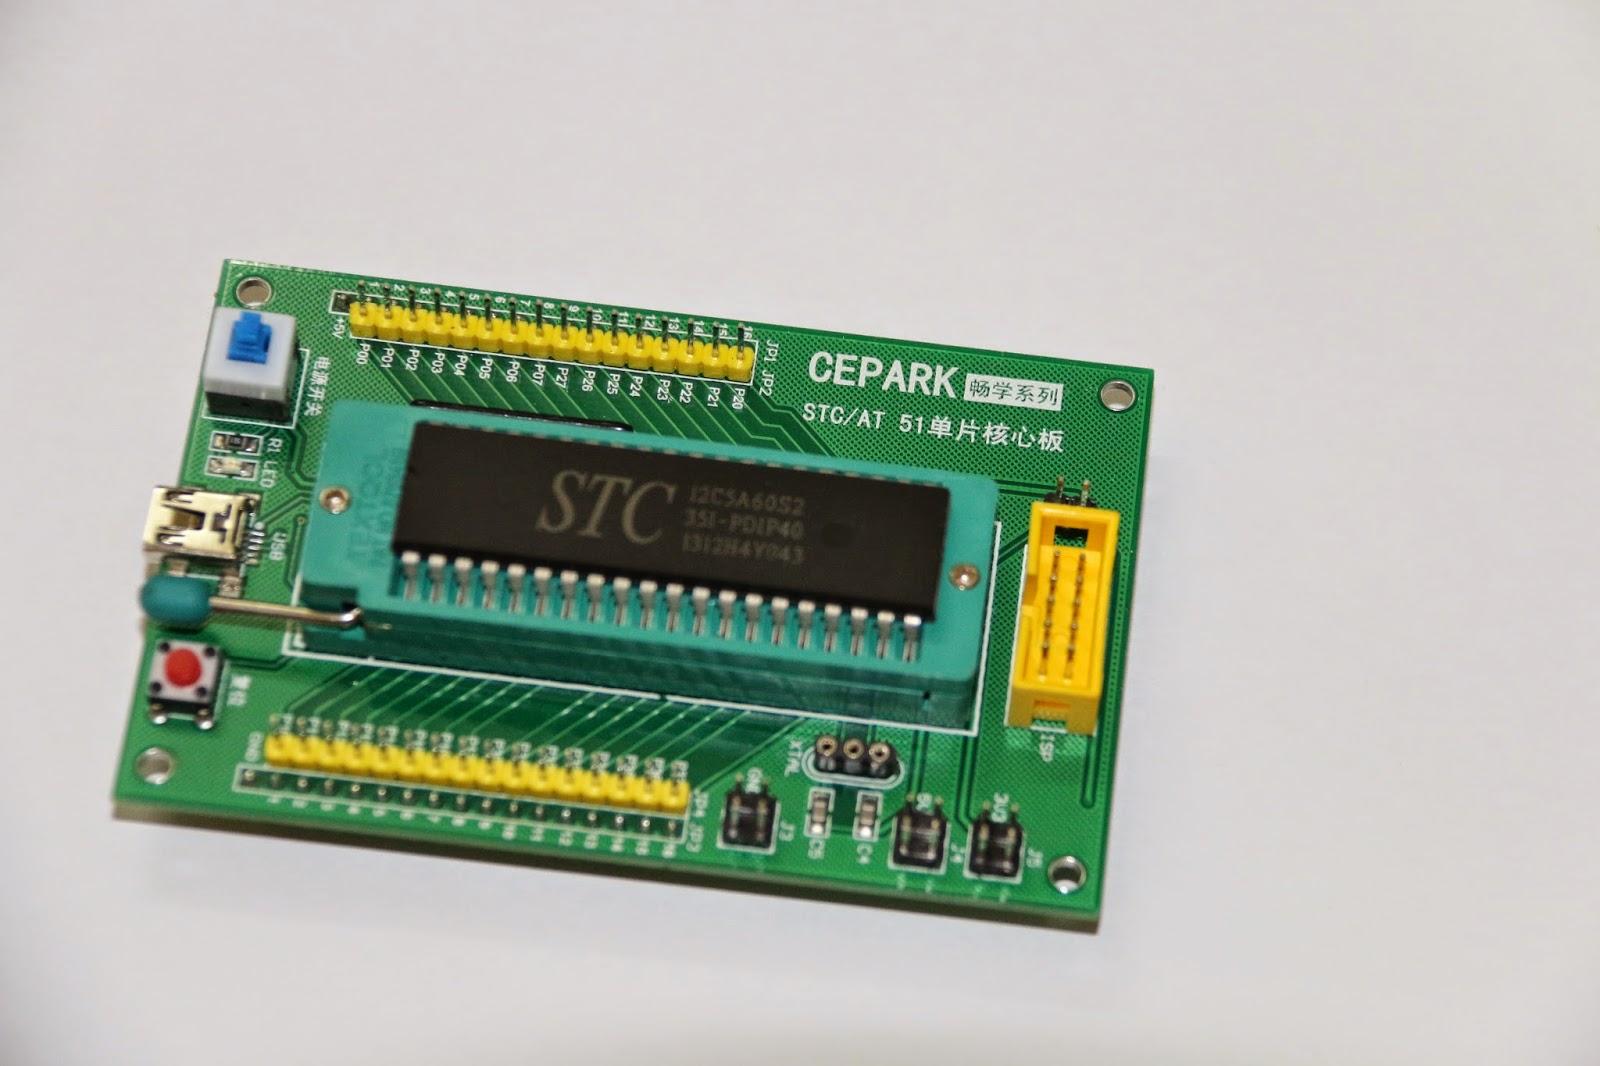 CEPARK AT51